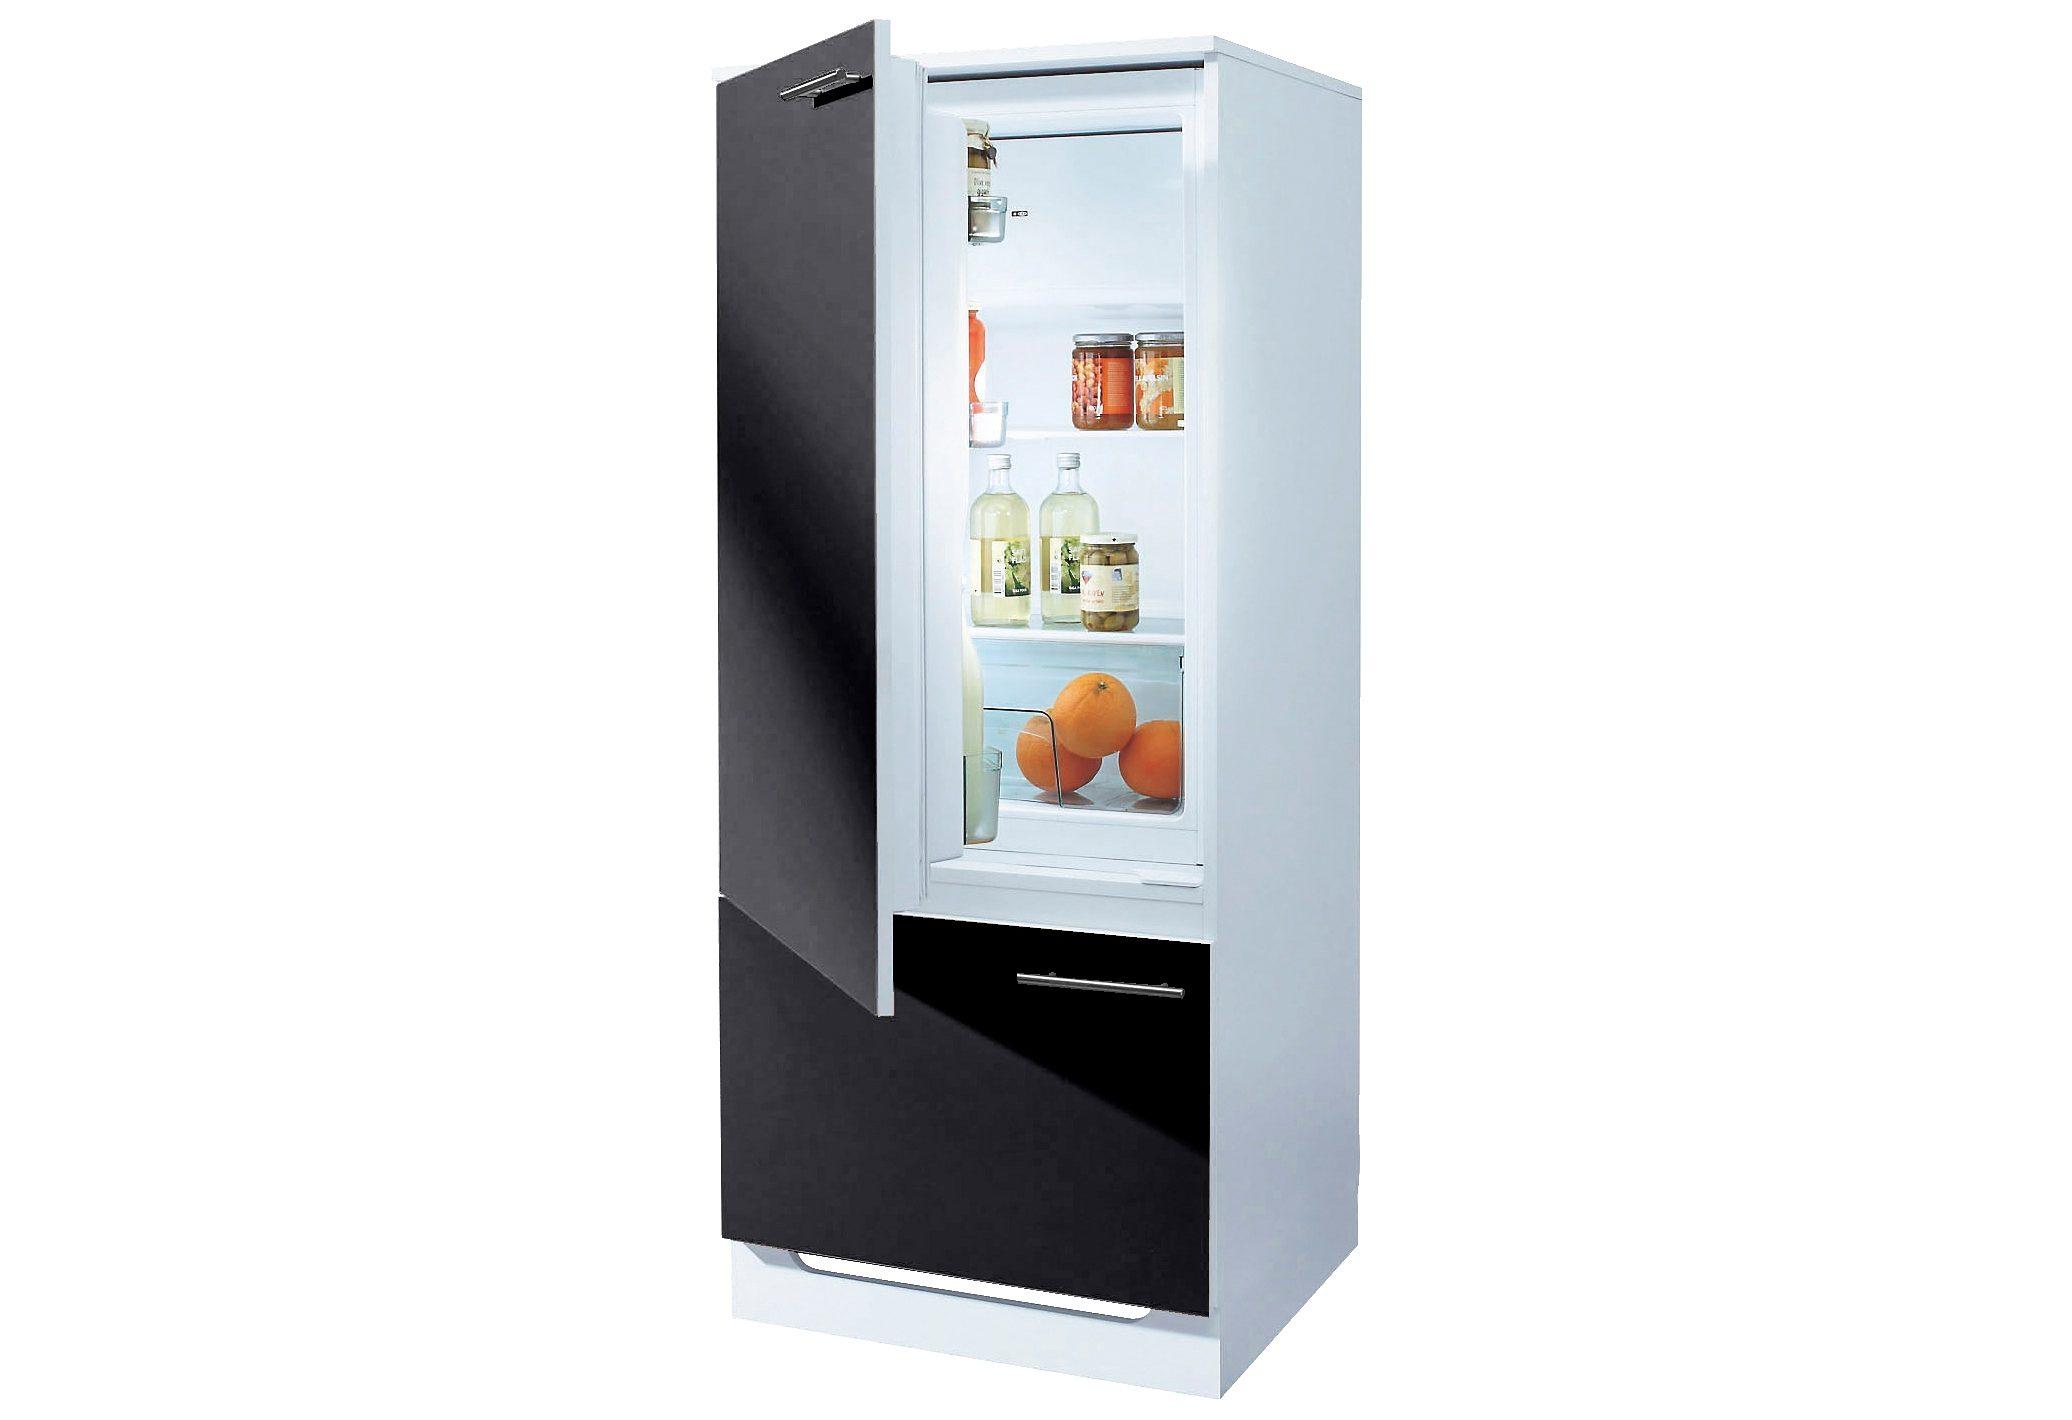 Amica Kühlschrank Hellblau : Kühlschrank amica schönheit retro kühlschrank blau amica kgc